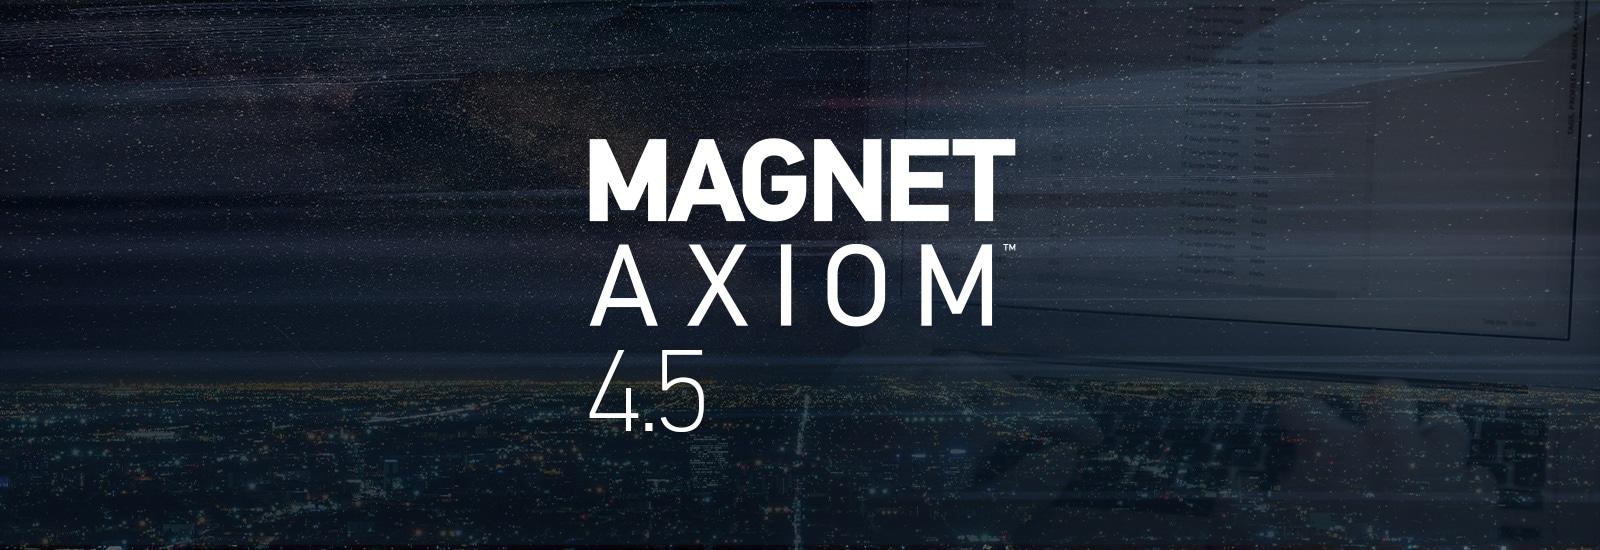 Magnet AXIOM 4.5